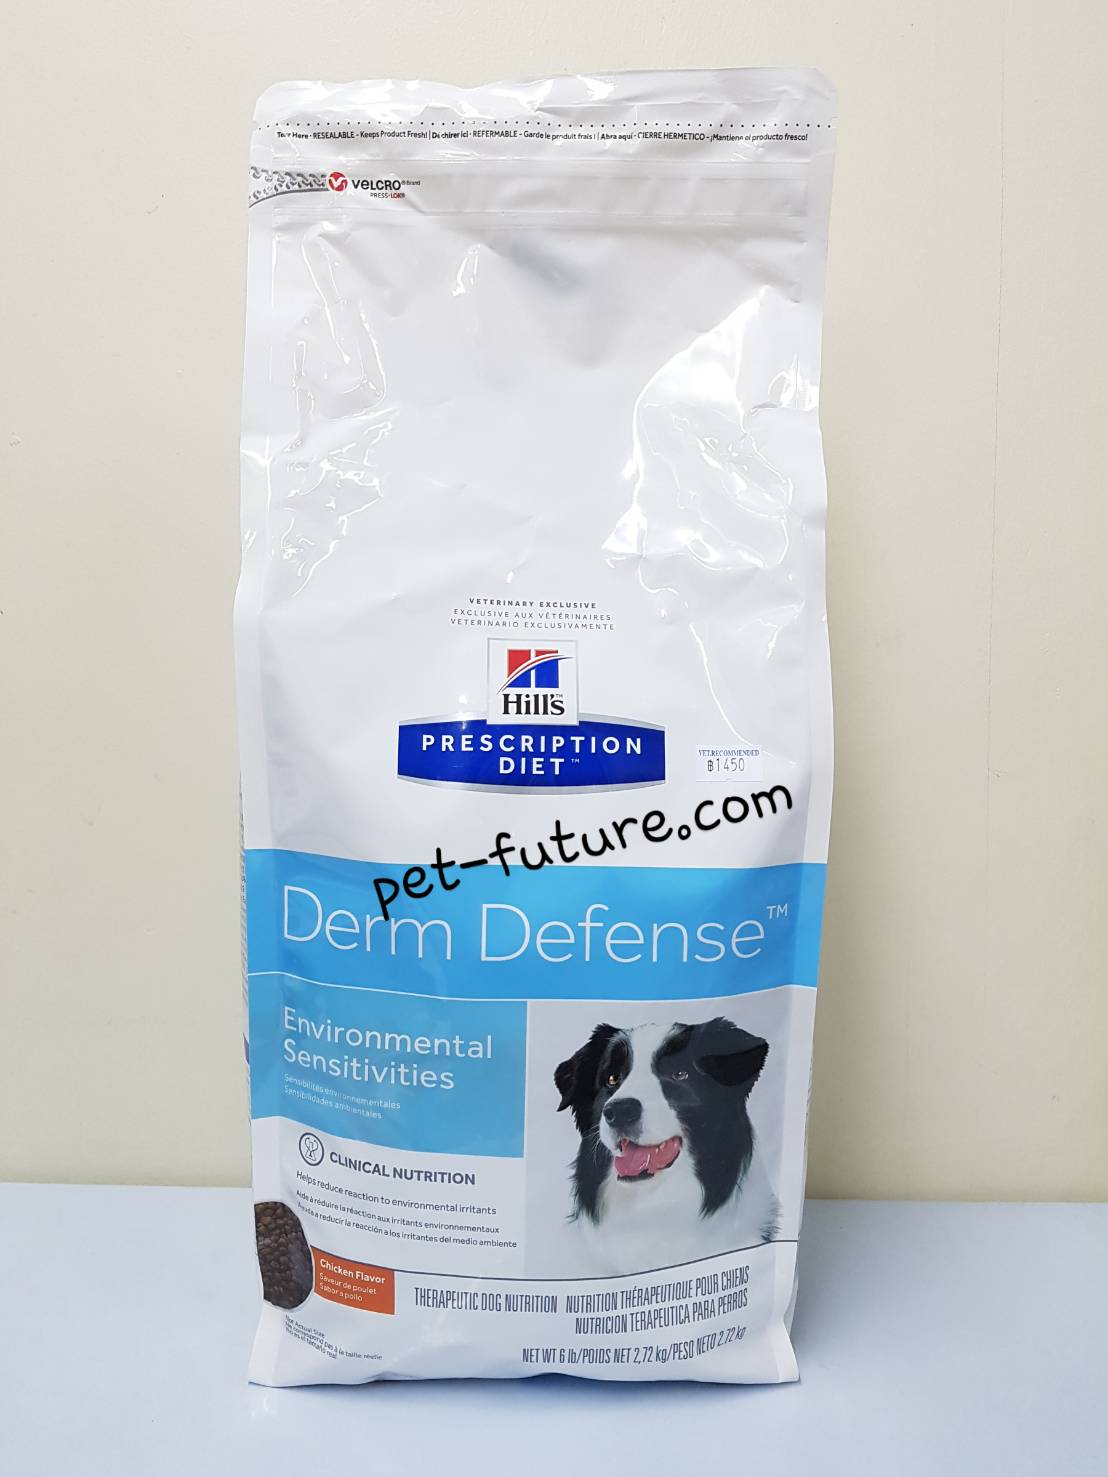 Derm Defense Exp.10/18 โภชนาการสูตรแรกสำหรับสุนัขที่มีภูมิคุ้มกันอ่อน 2.7 kg.